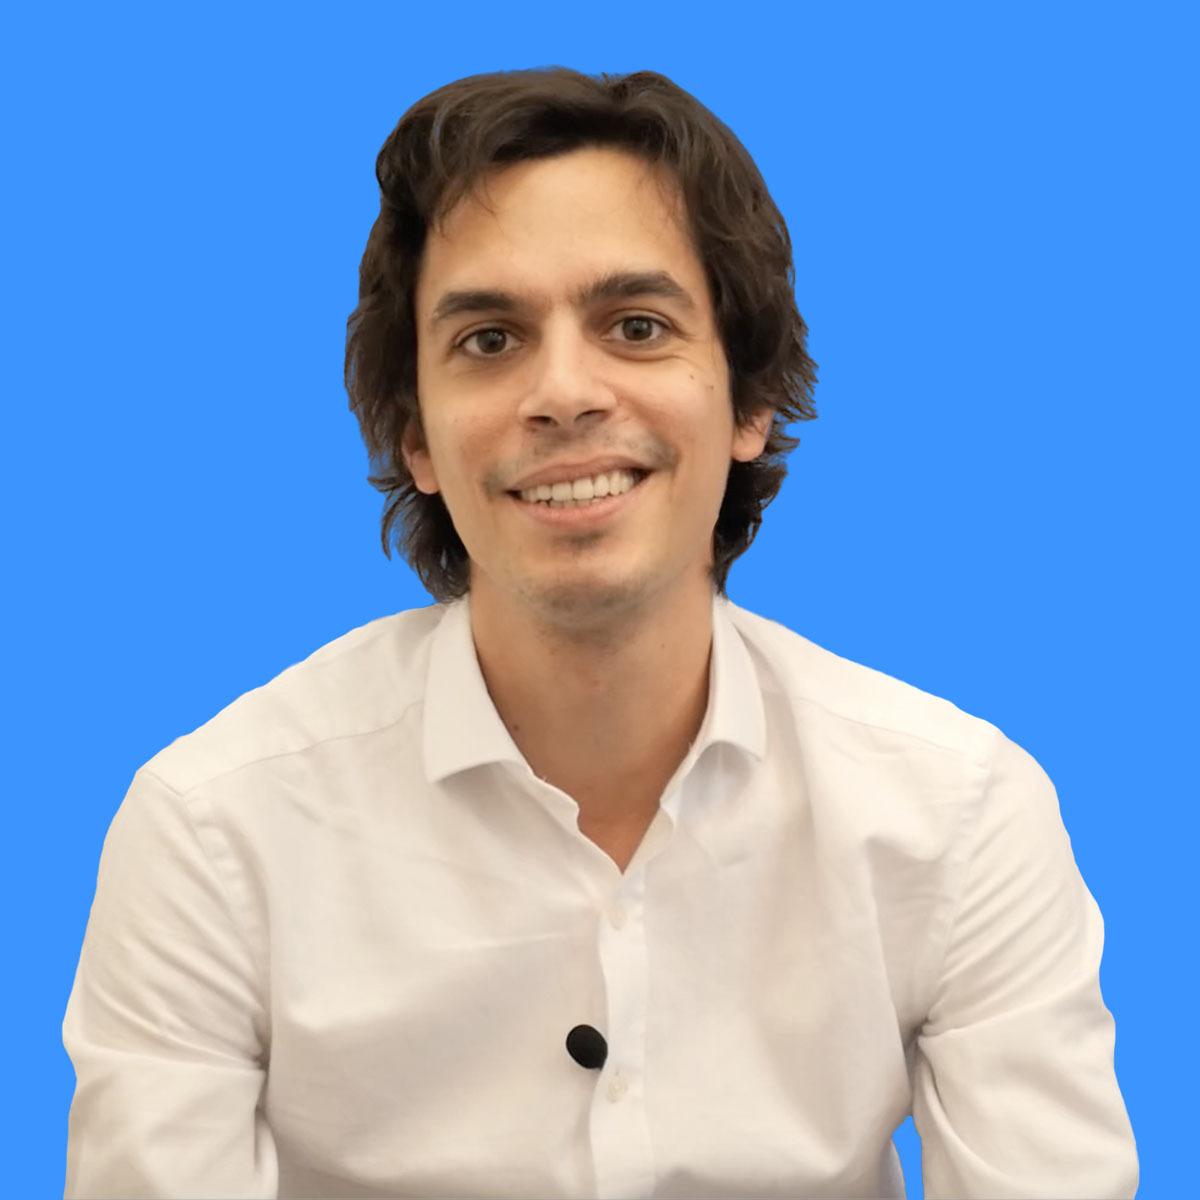 L'interview de Raffael, bêta-testeur de Blank